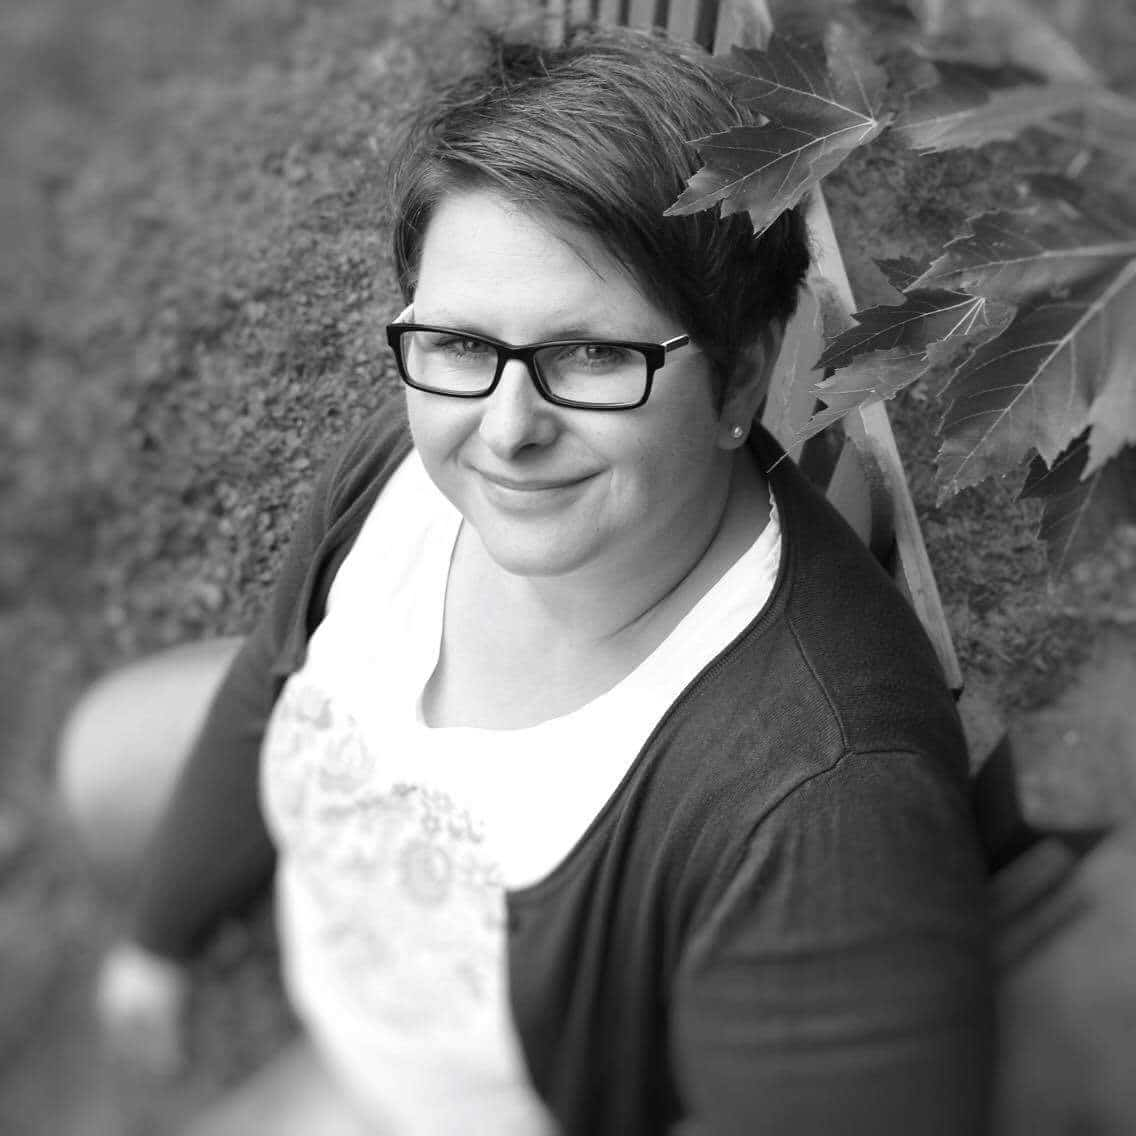 Daniela Klostermann